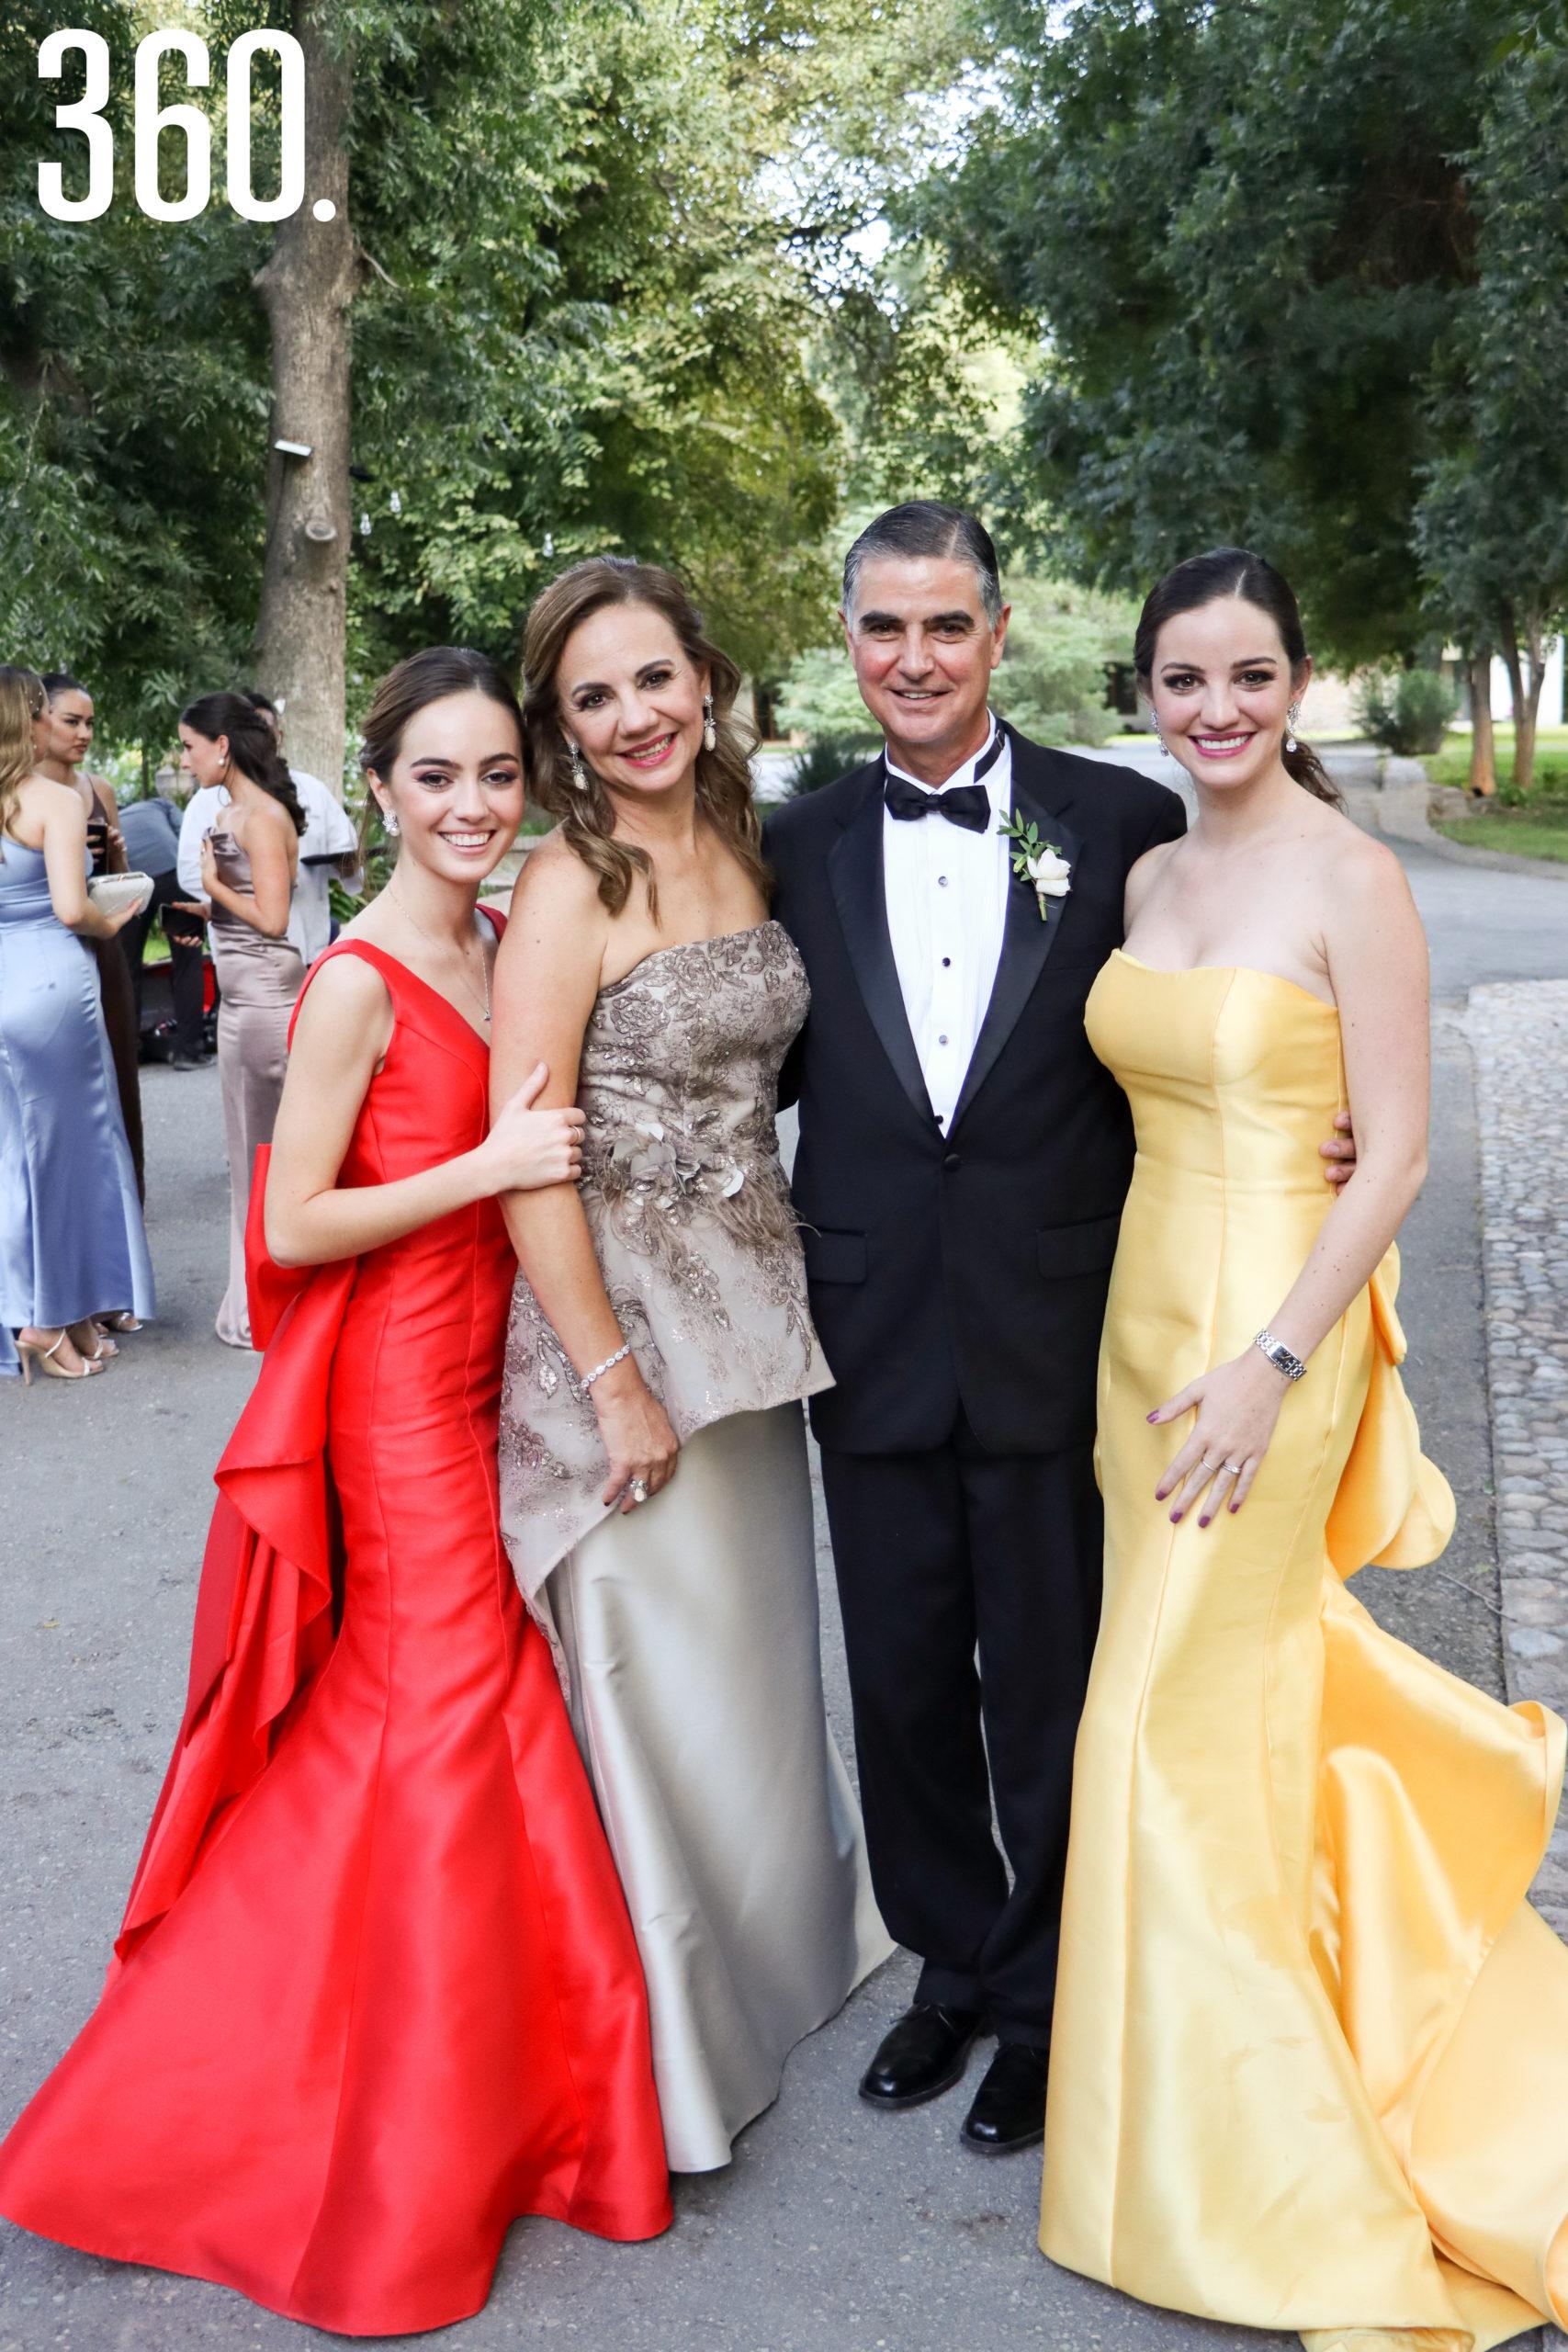 Daniela Morales, Silvia de la Peña, Marco Antonio Morales y Silvia Morales, hermanas y padres de la novia.